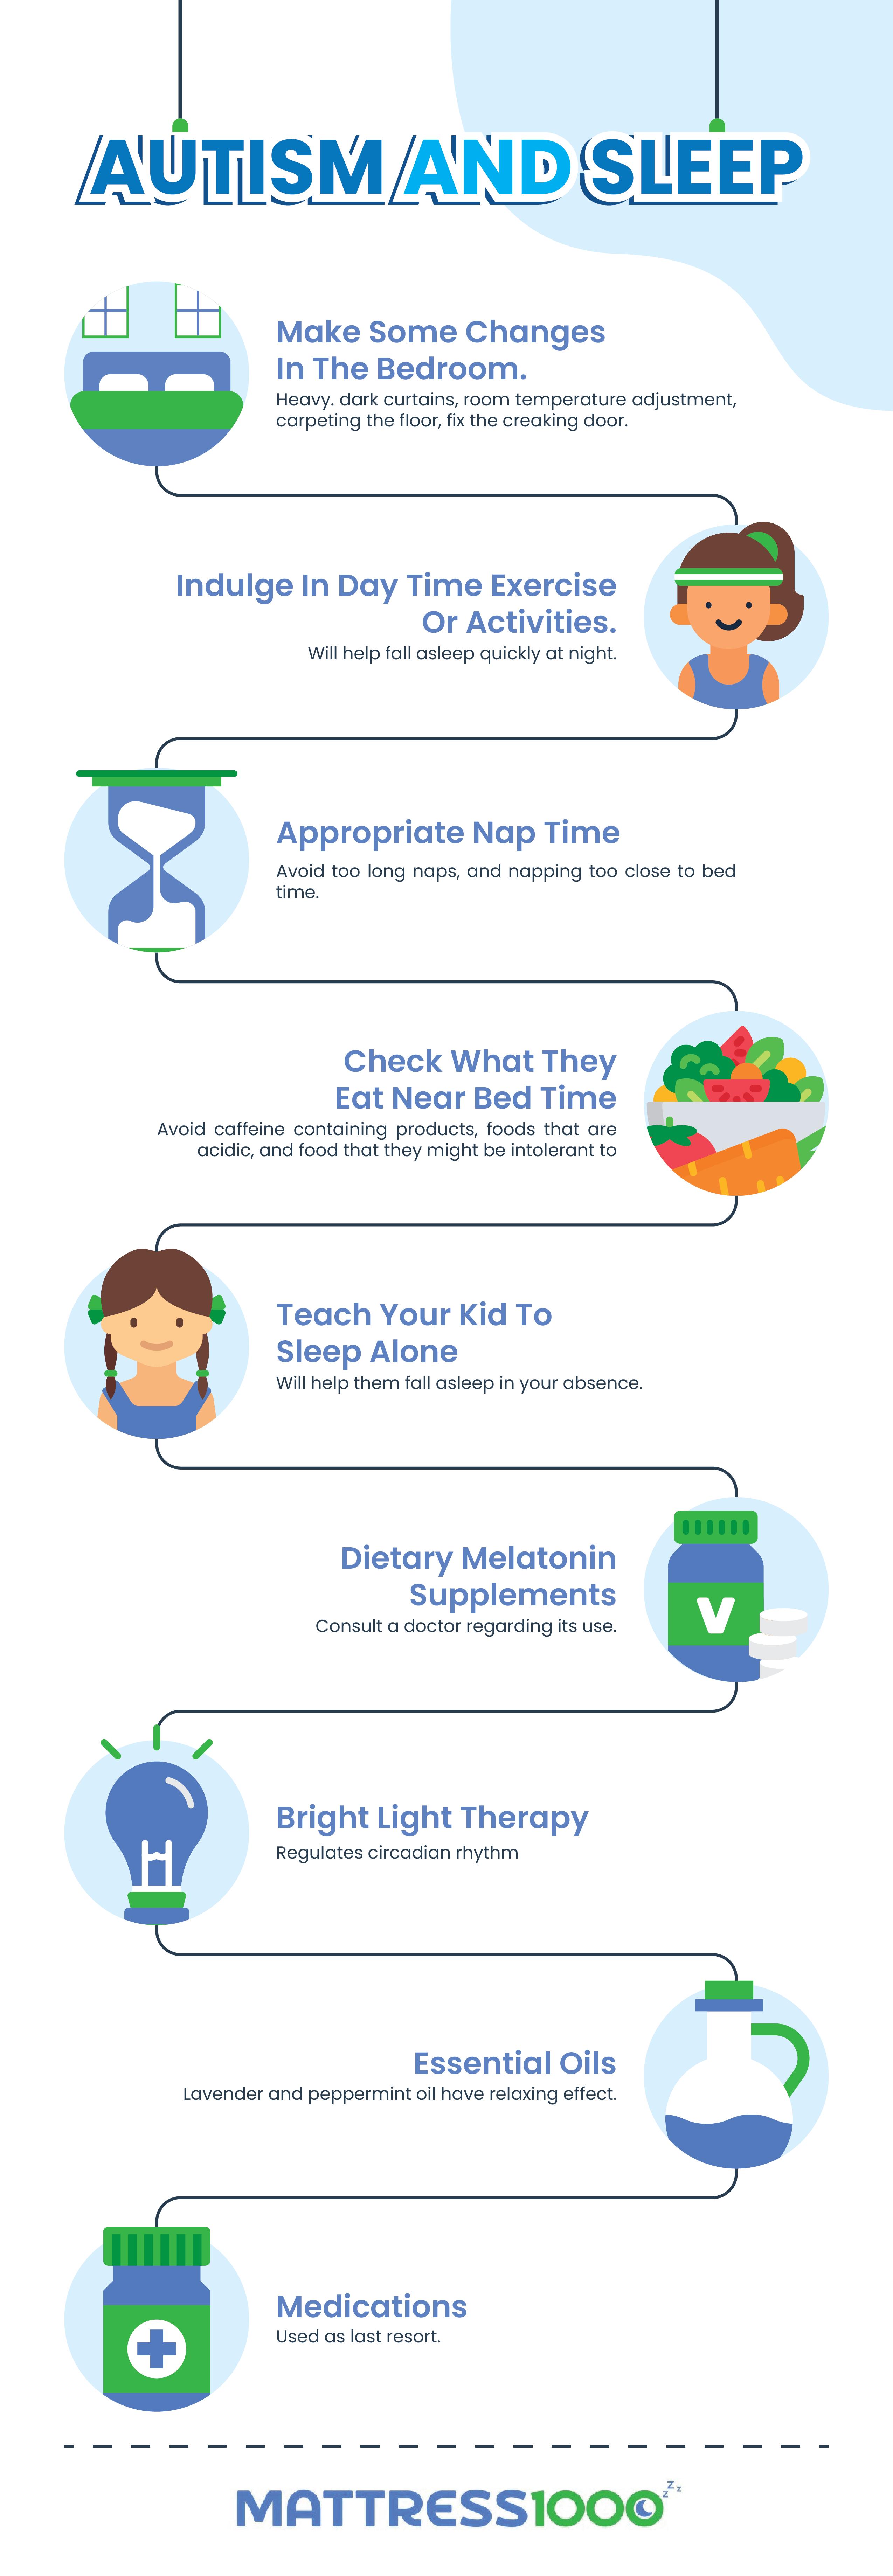 Autism and Sleep Infographic